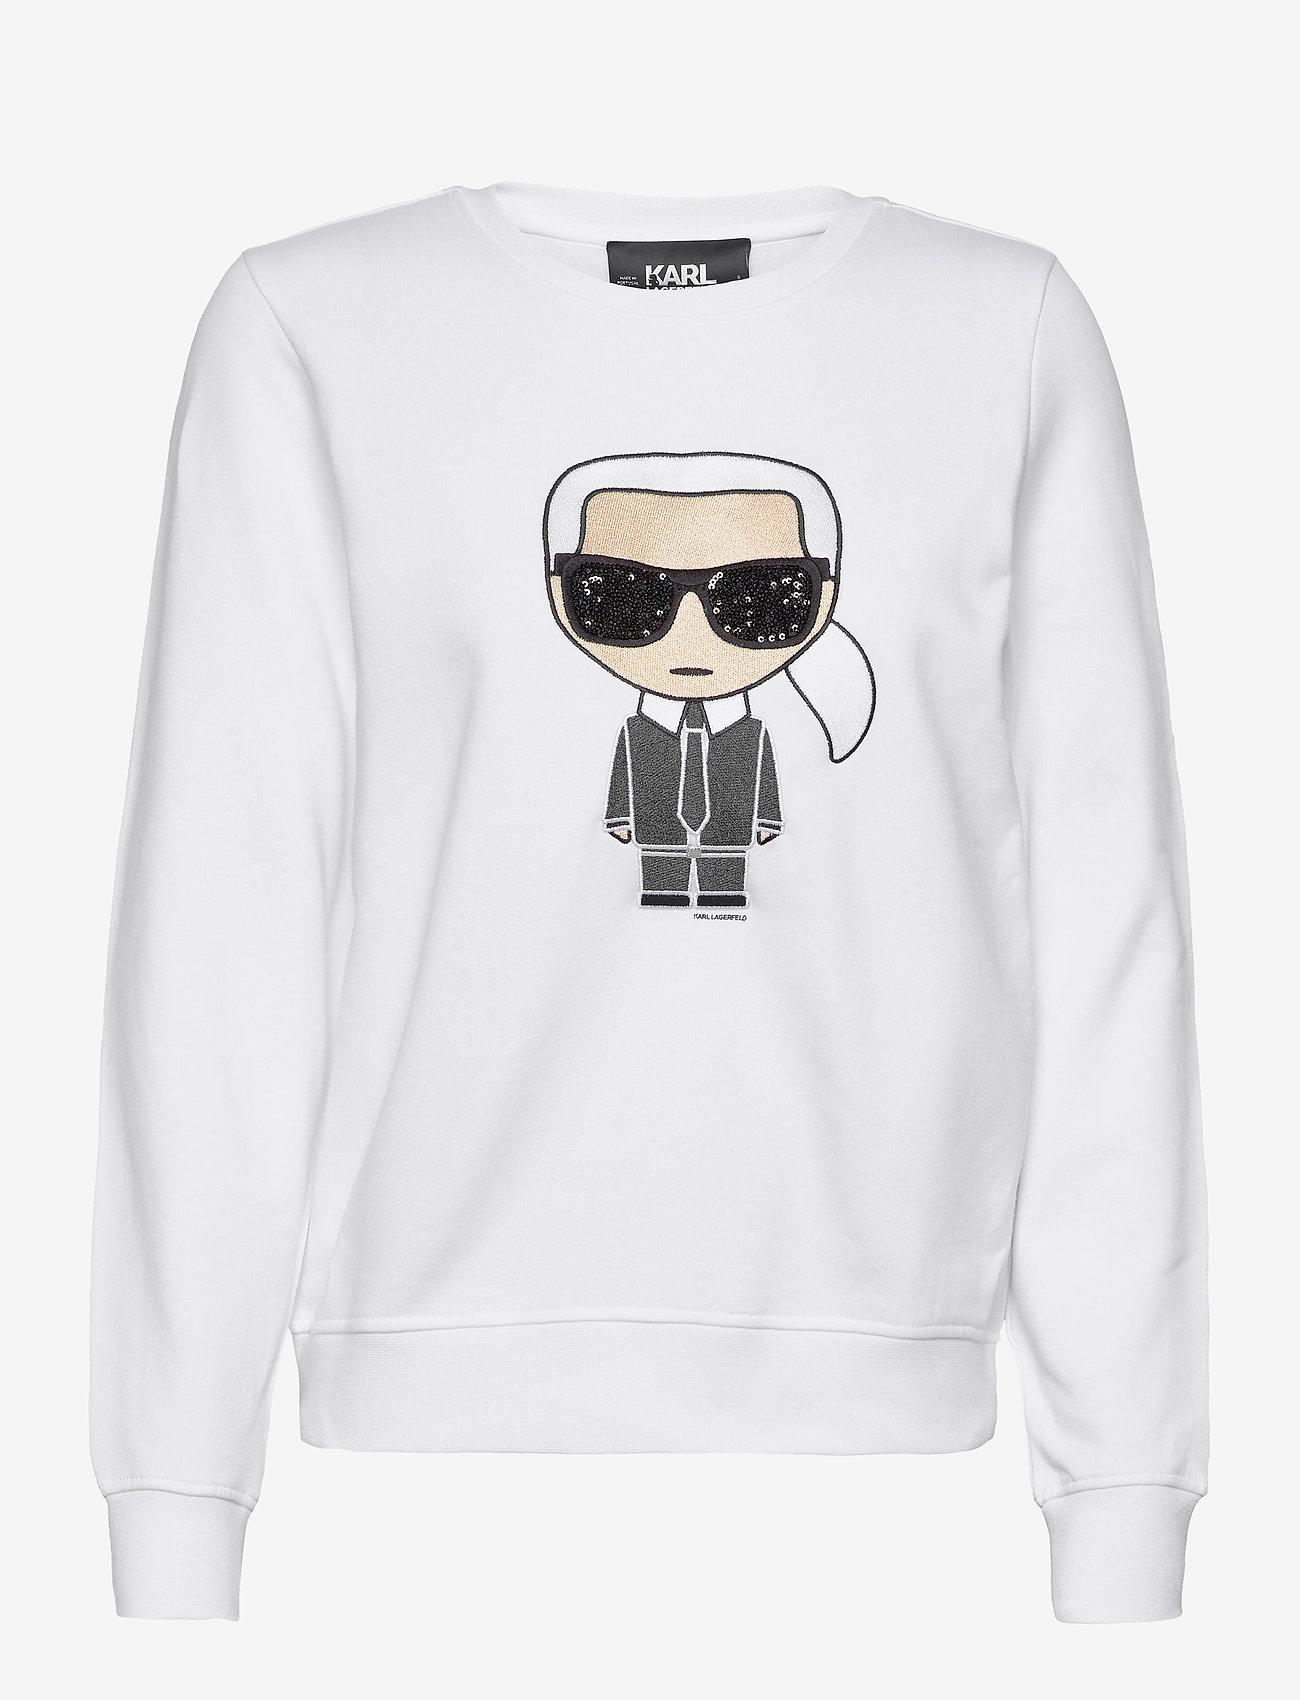 Karl Lagerfeld ikonik karl sweatshirt - Sweatshirts WHITE - Dameklær Spesialtilbud